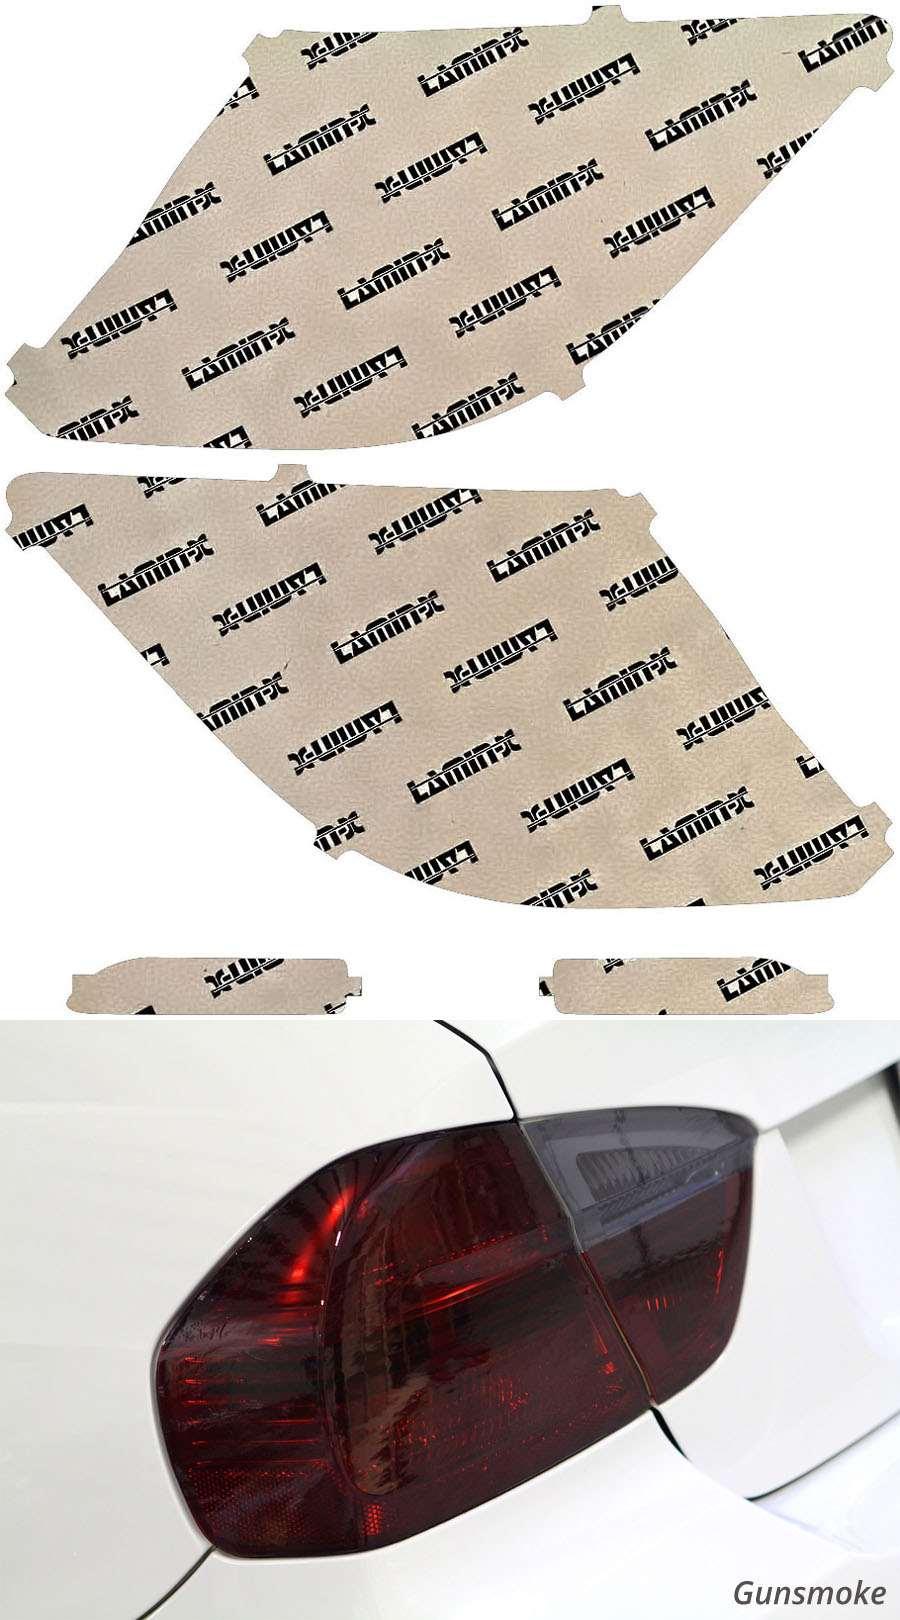 Honda Crosstour 13-15 Gunsmoke Tail Light Covers Lamin-X H254G